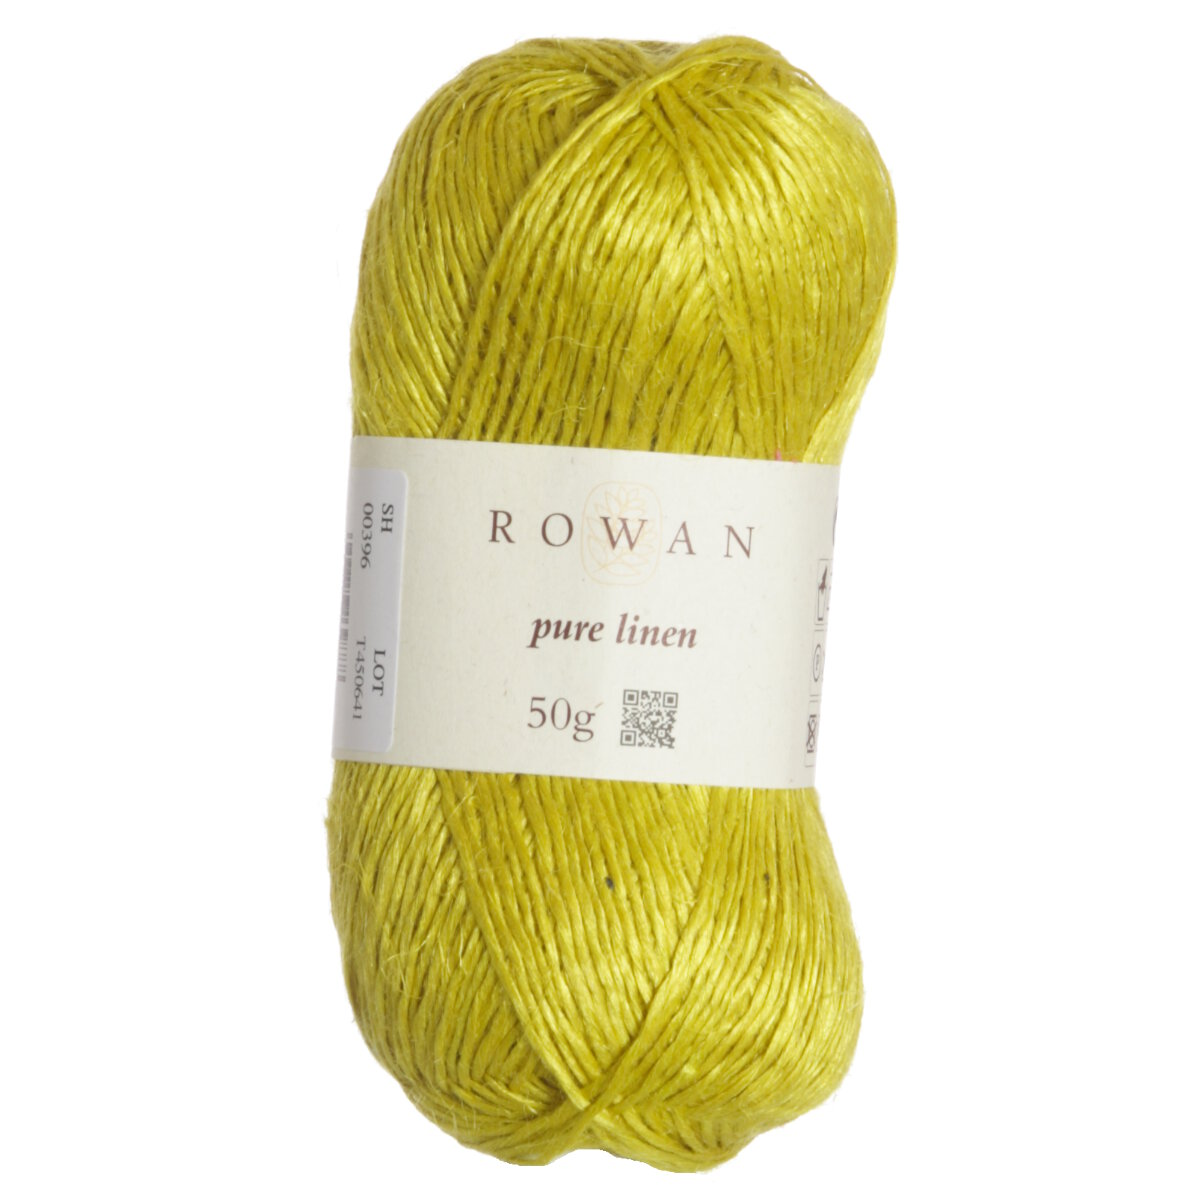 Linen Yarn : ... we no longer carry the product Rowan Pure Linen Yarn - 396 Simpson